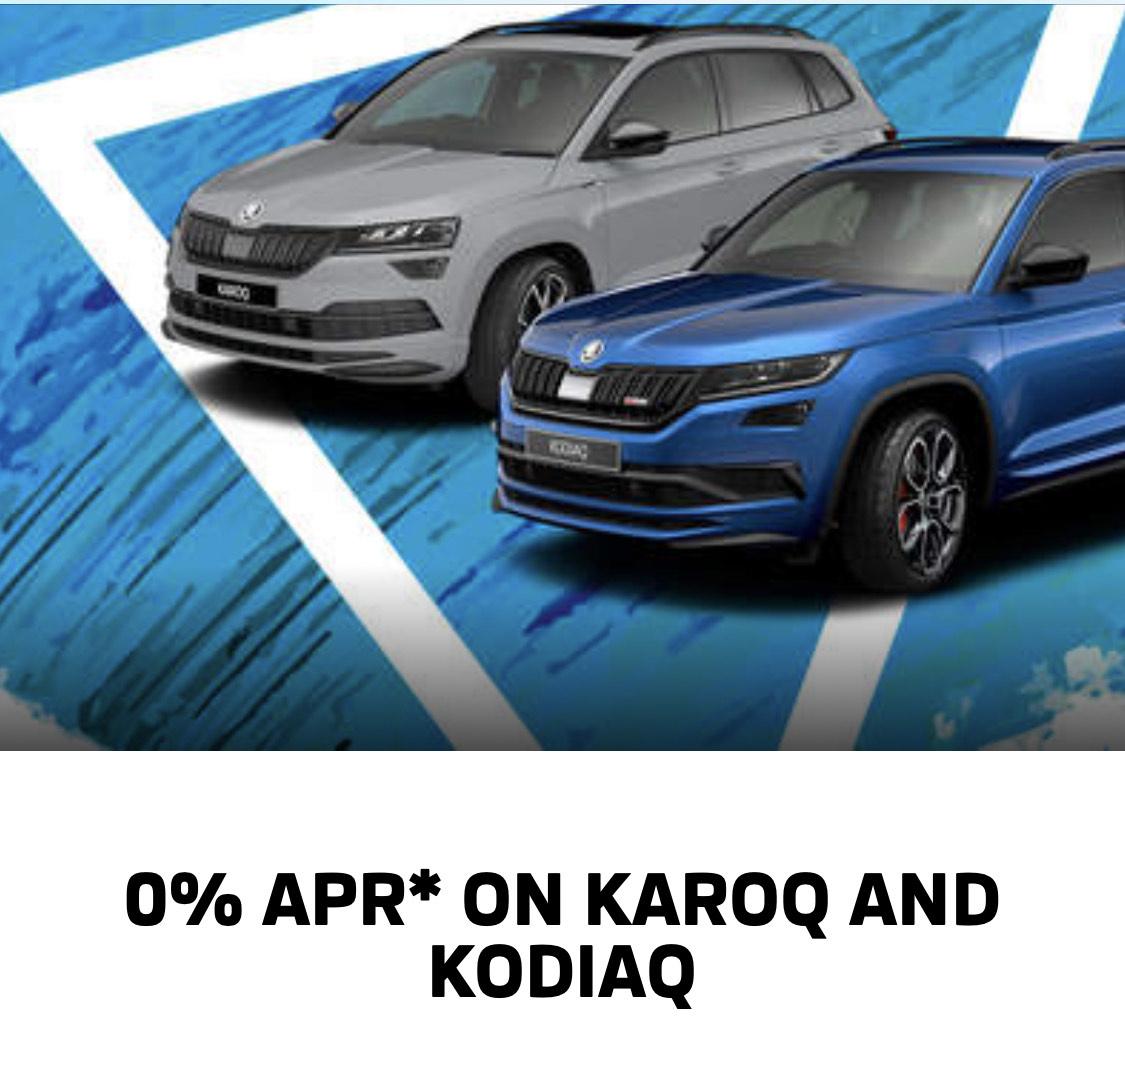 Skoda offering 0% APR ON Karoq and Kodiaq only